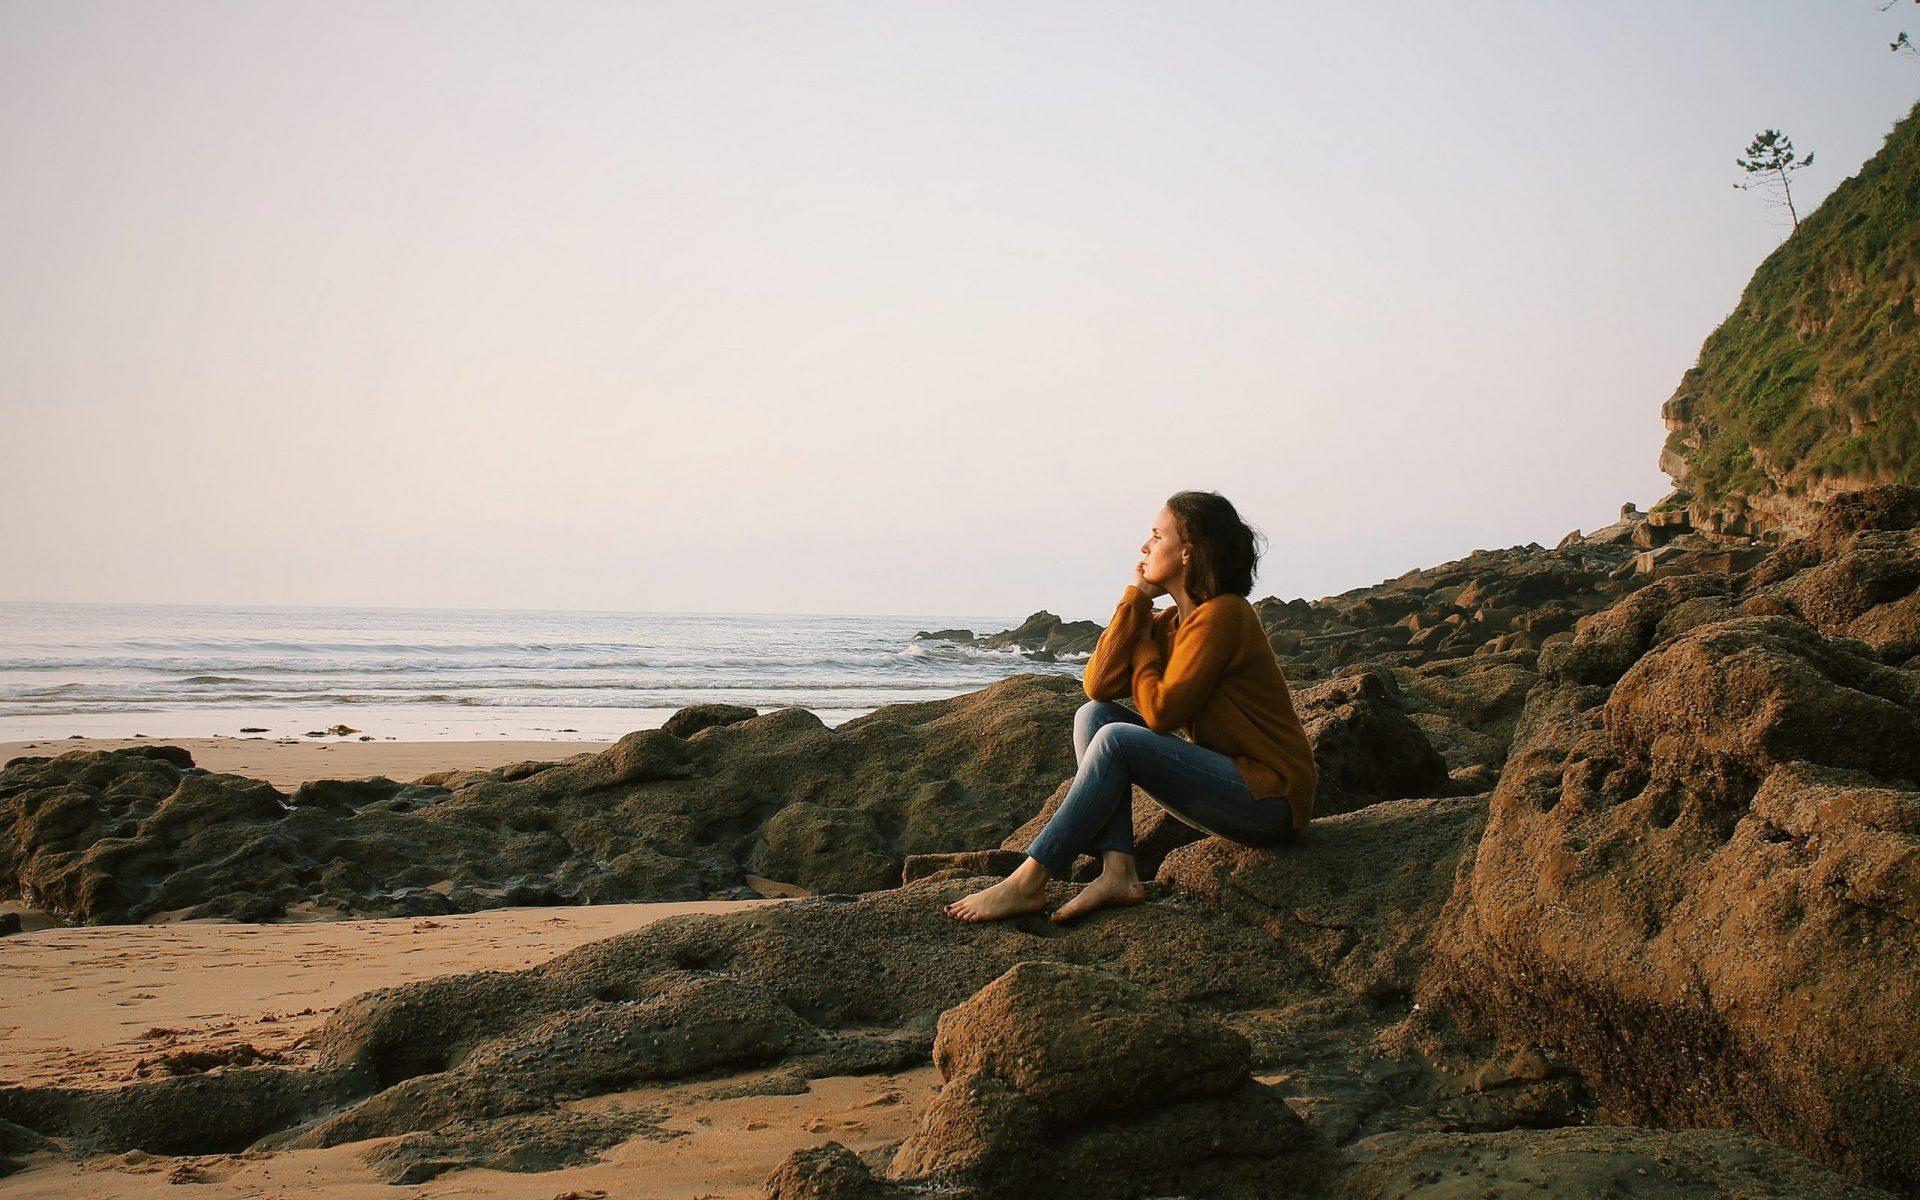 woman sitting near sea during daytime